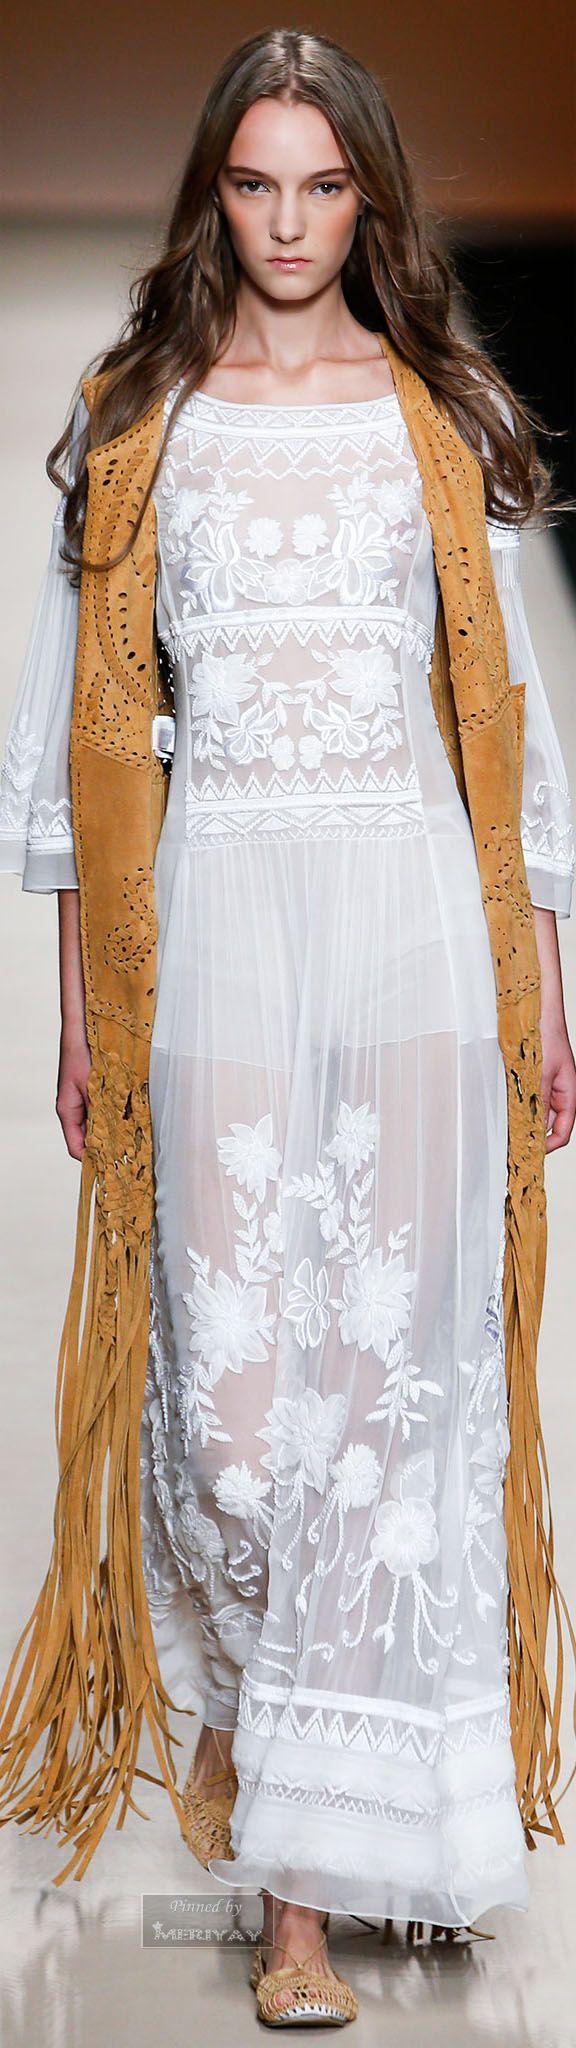 TatiTati Style ✤ Alberta Ferretti.Spring-summer 2015- ♔LadyLuxury♔